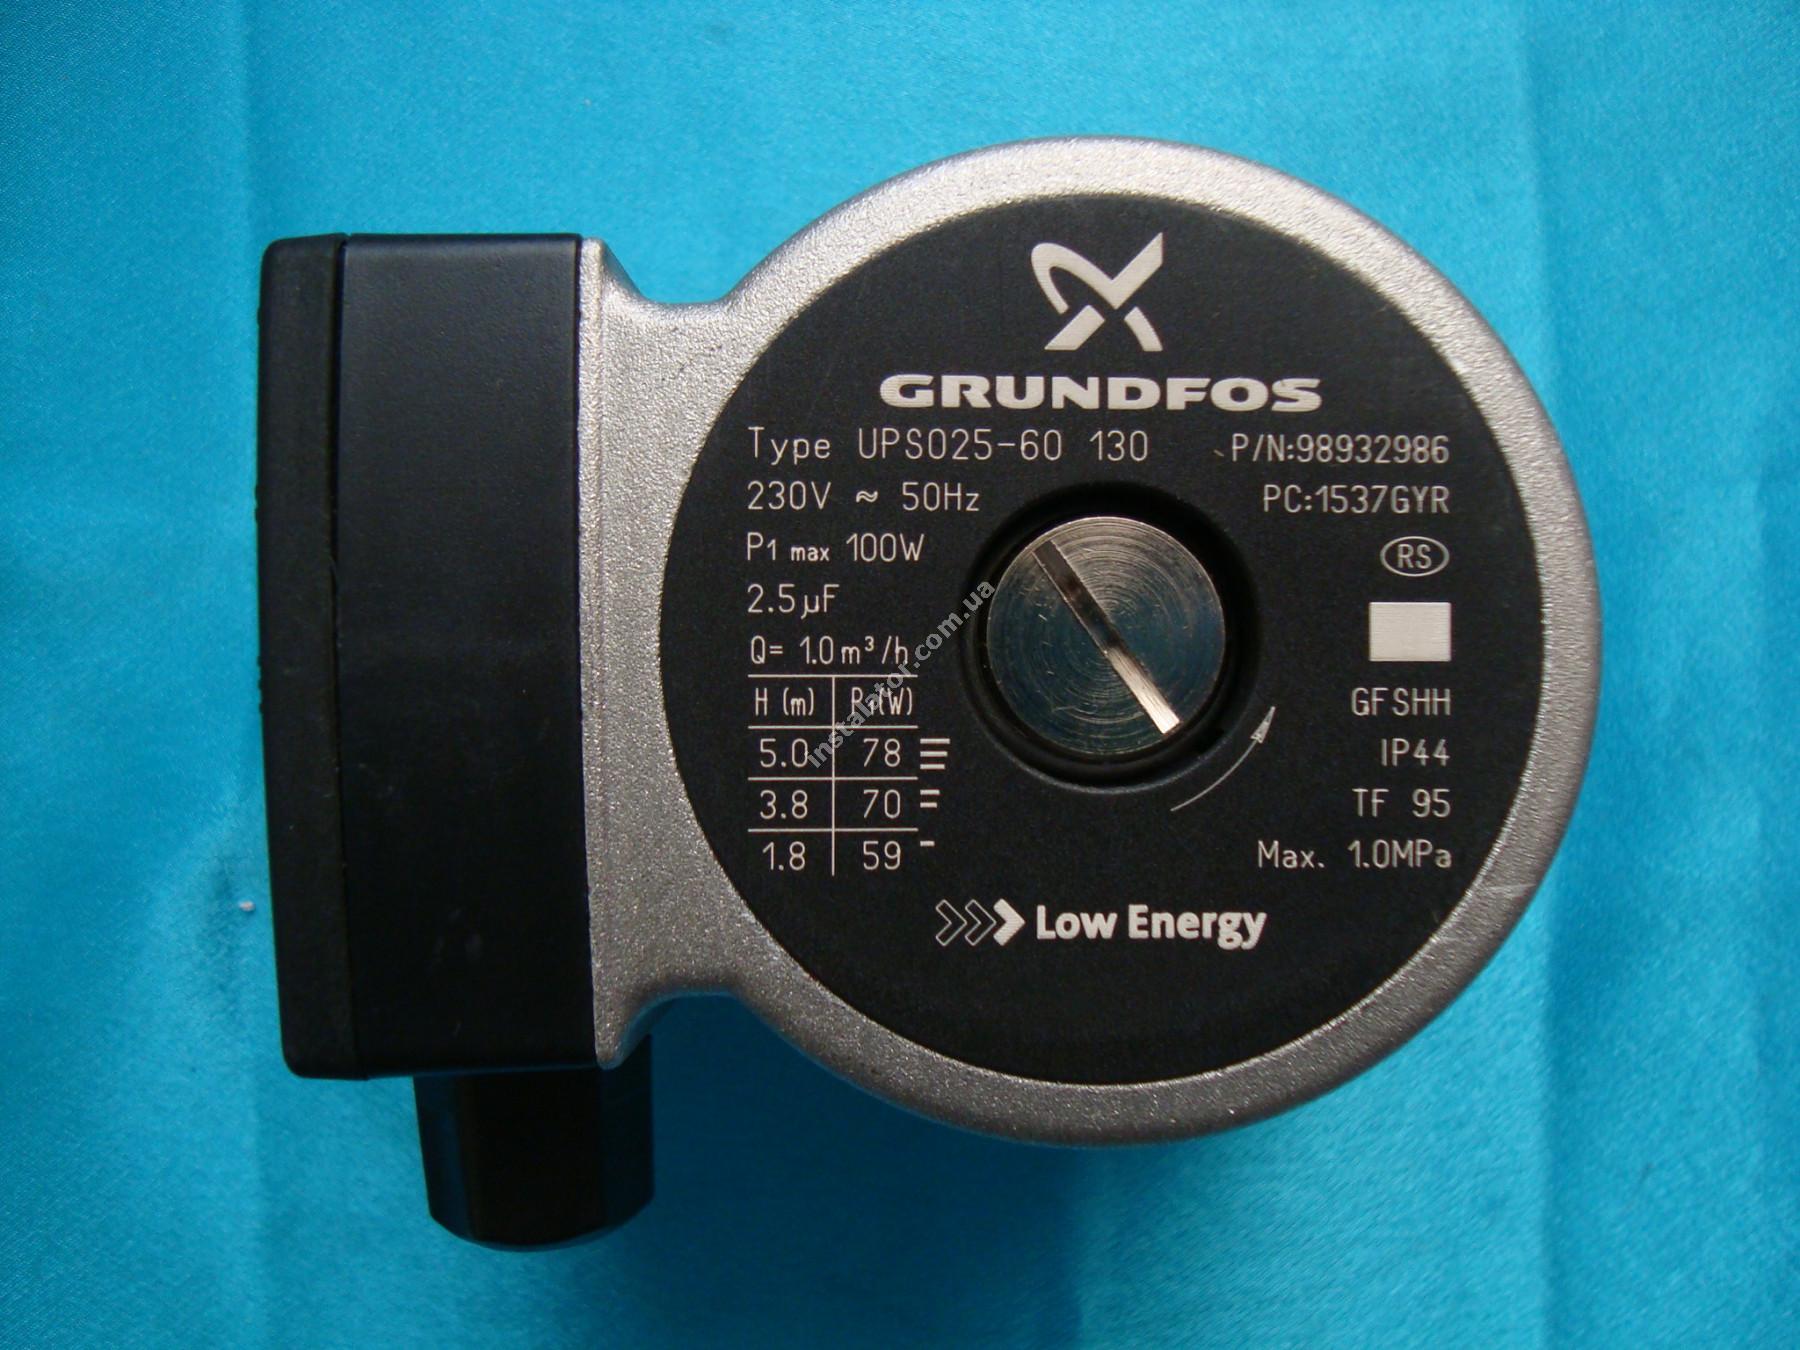 150100102 Циркуляційний насос Grundfos UPS 25-60 (база 130) full-image-0